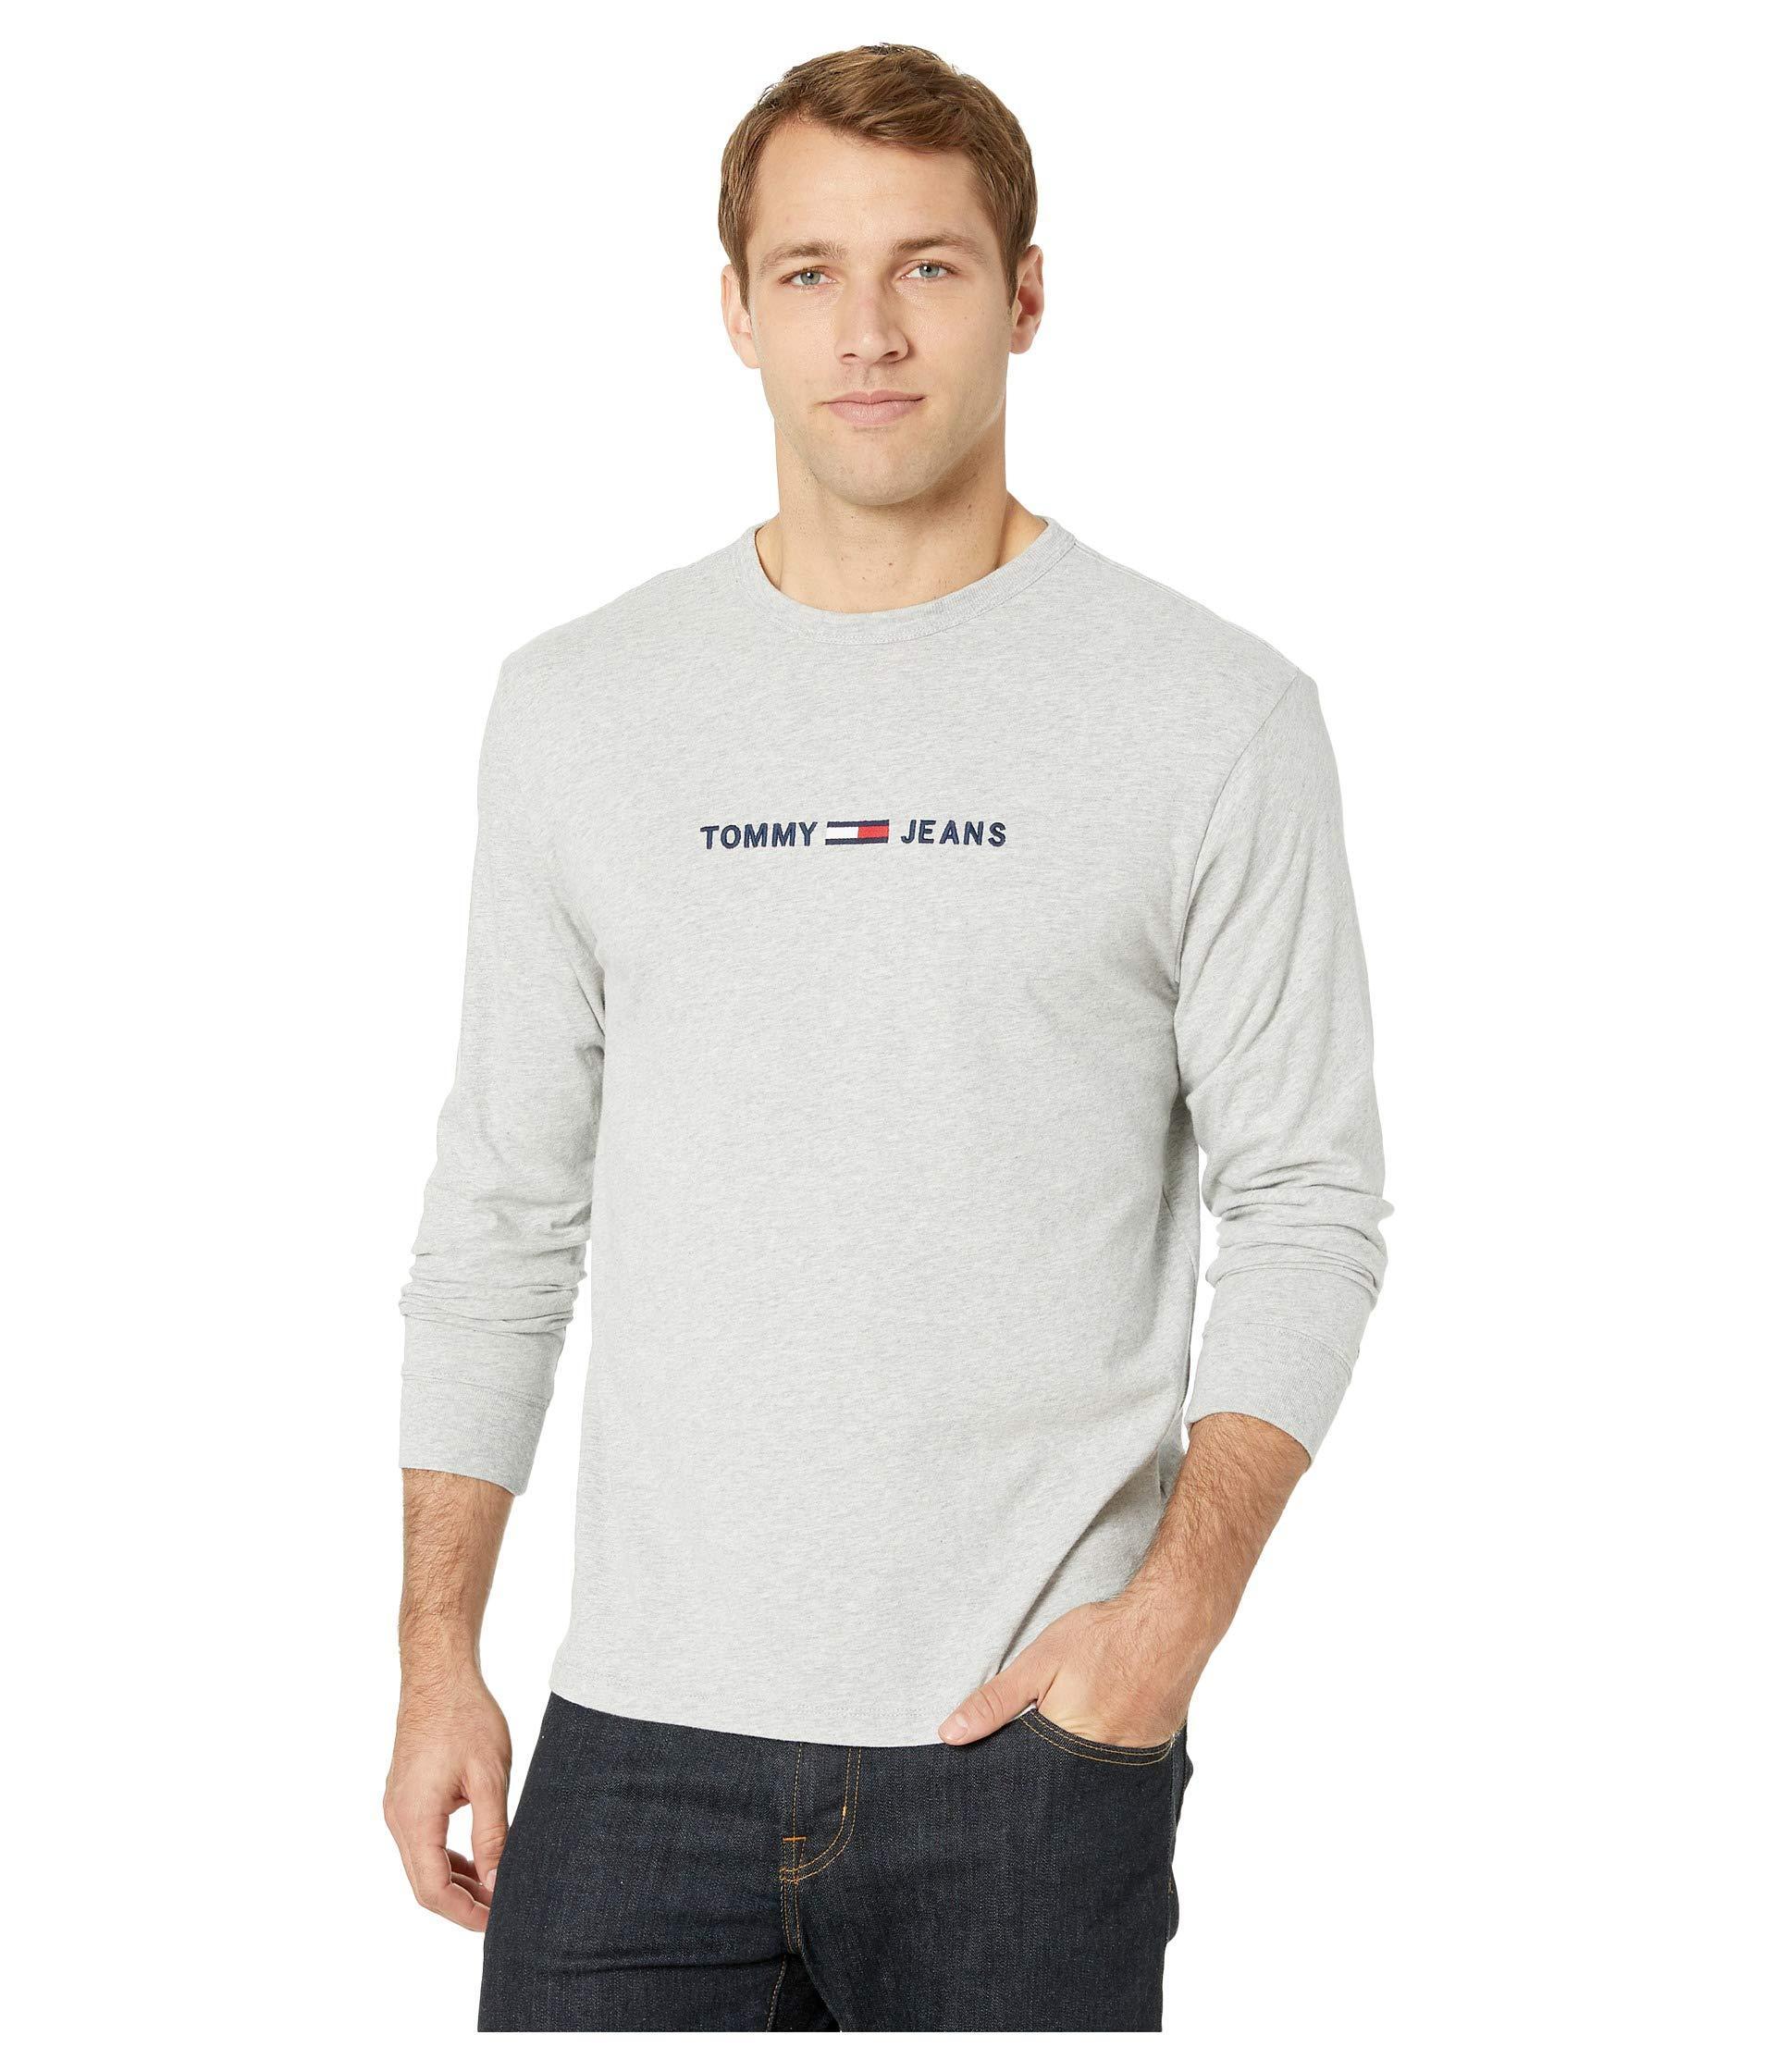 b1864c2e Tommy Hilfiger. Gray Small Text Long Sleeve (light Grey Heather) Men's  Clothing